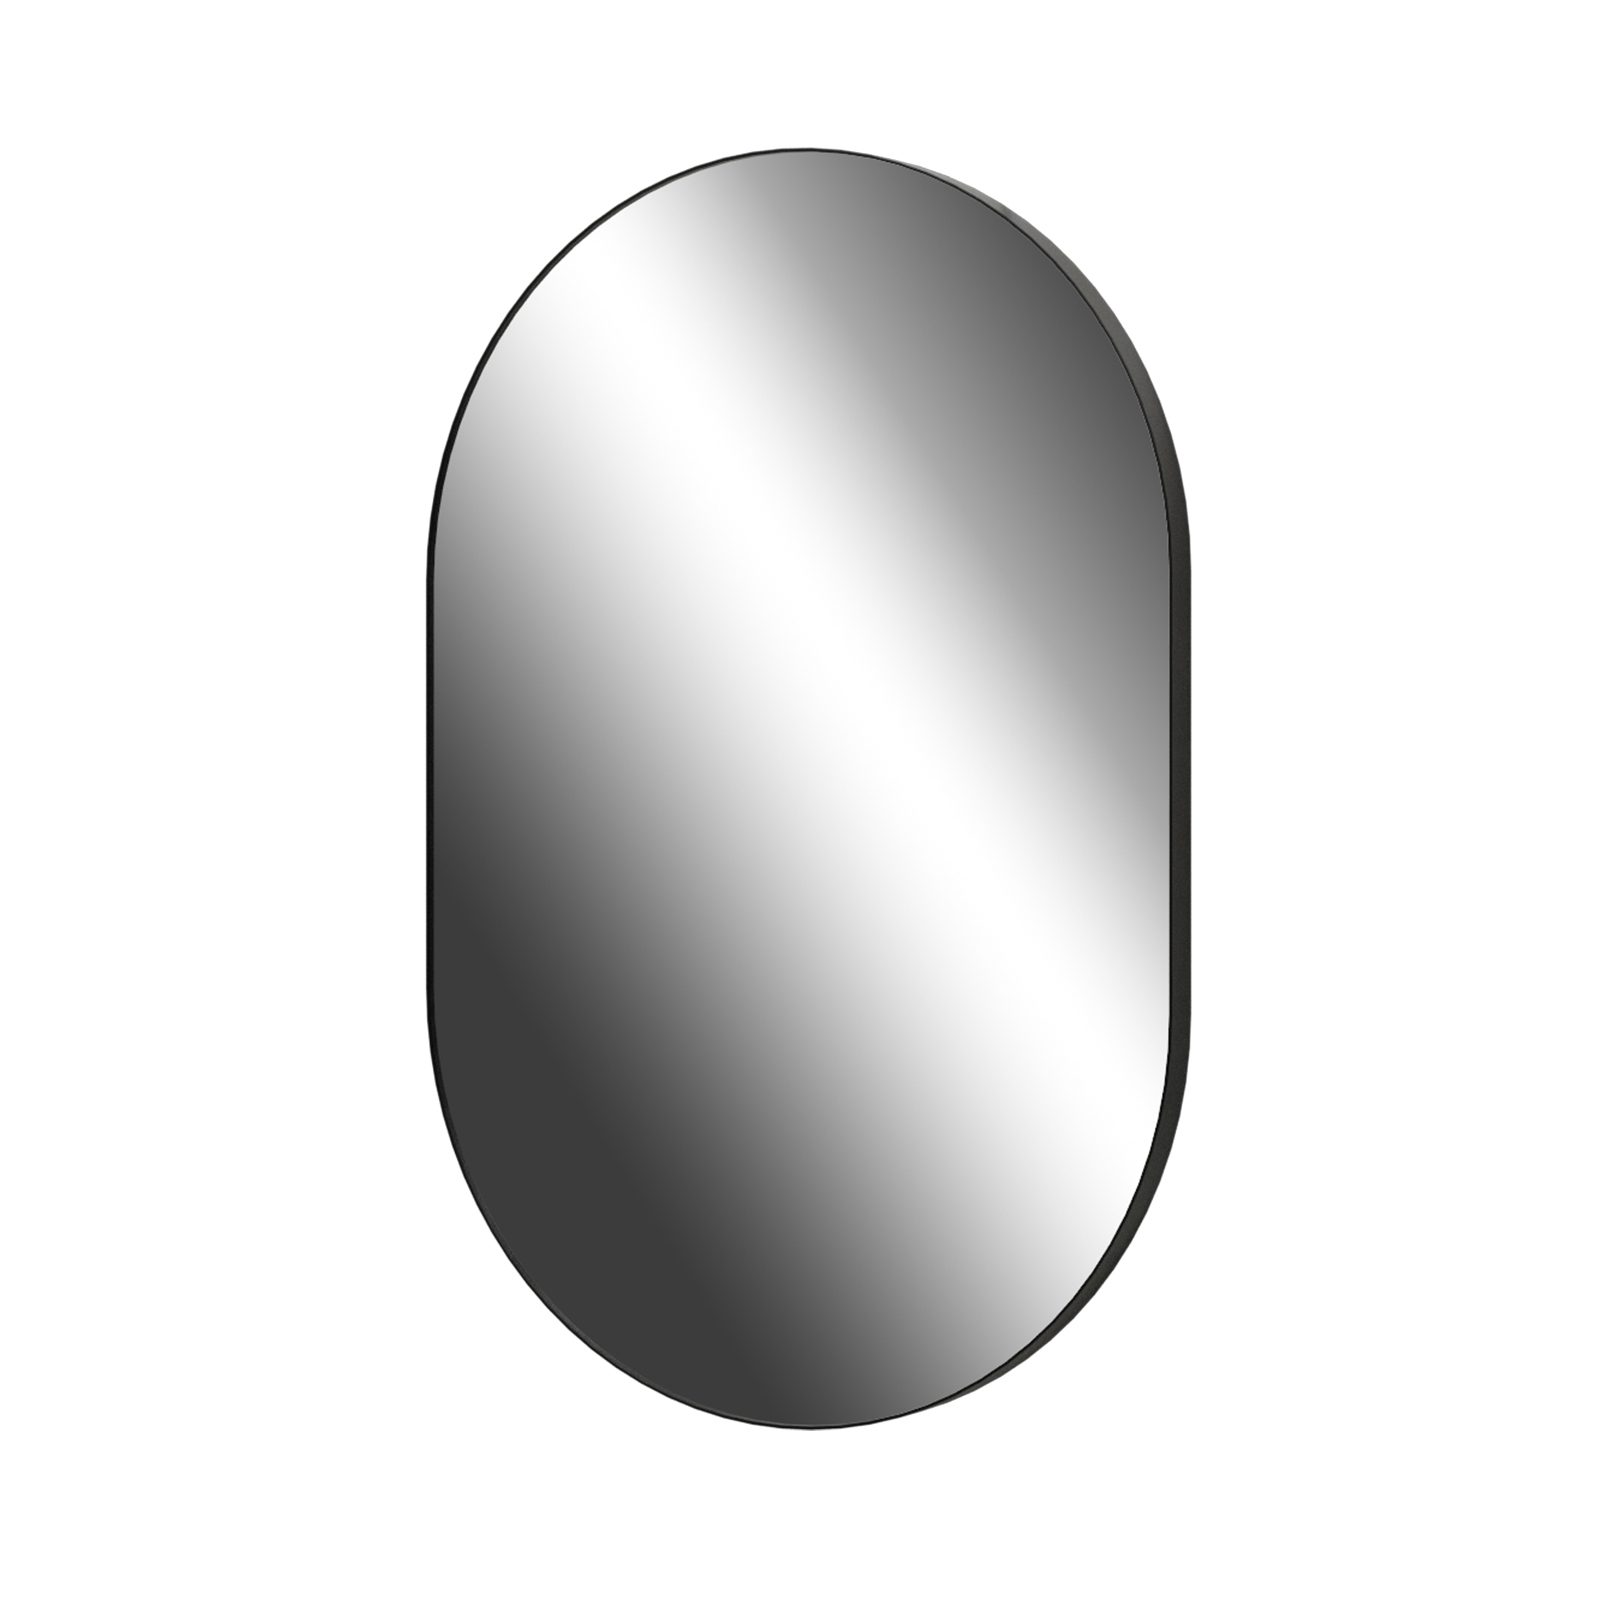 Living Elements 500 x 750 x 26mm Black Framed Oblong Mirror